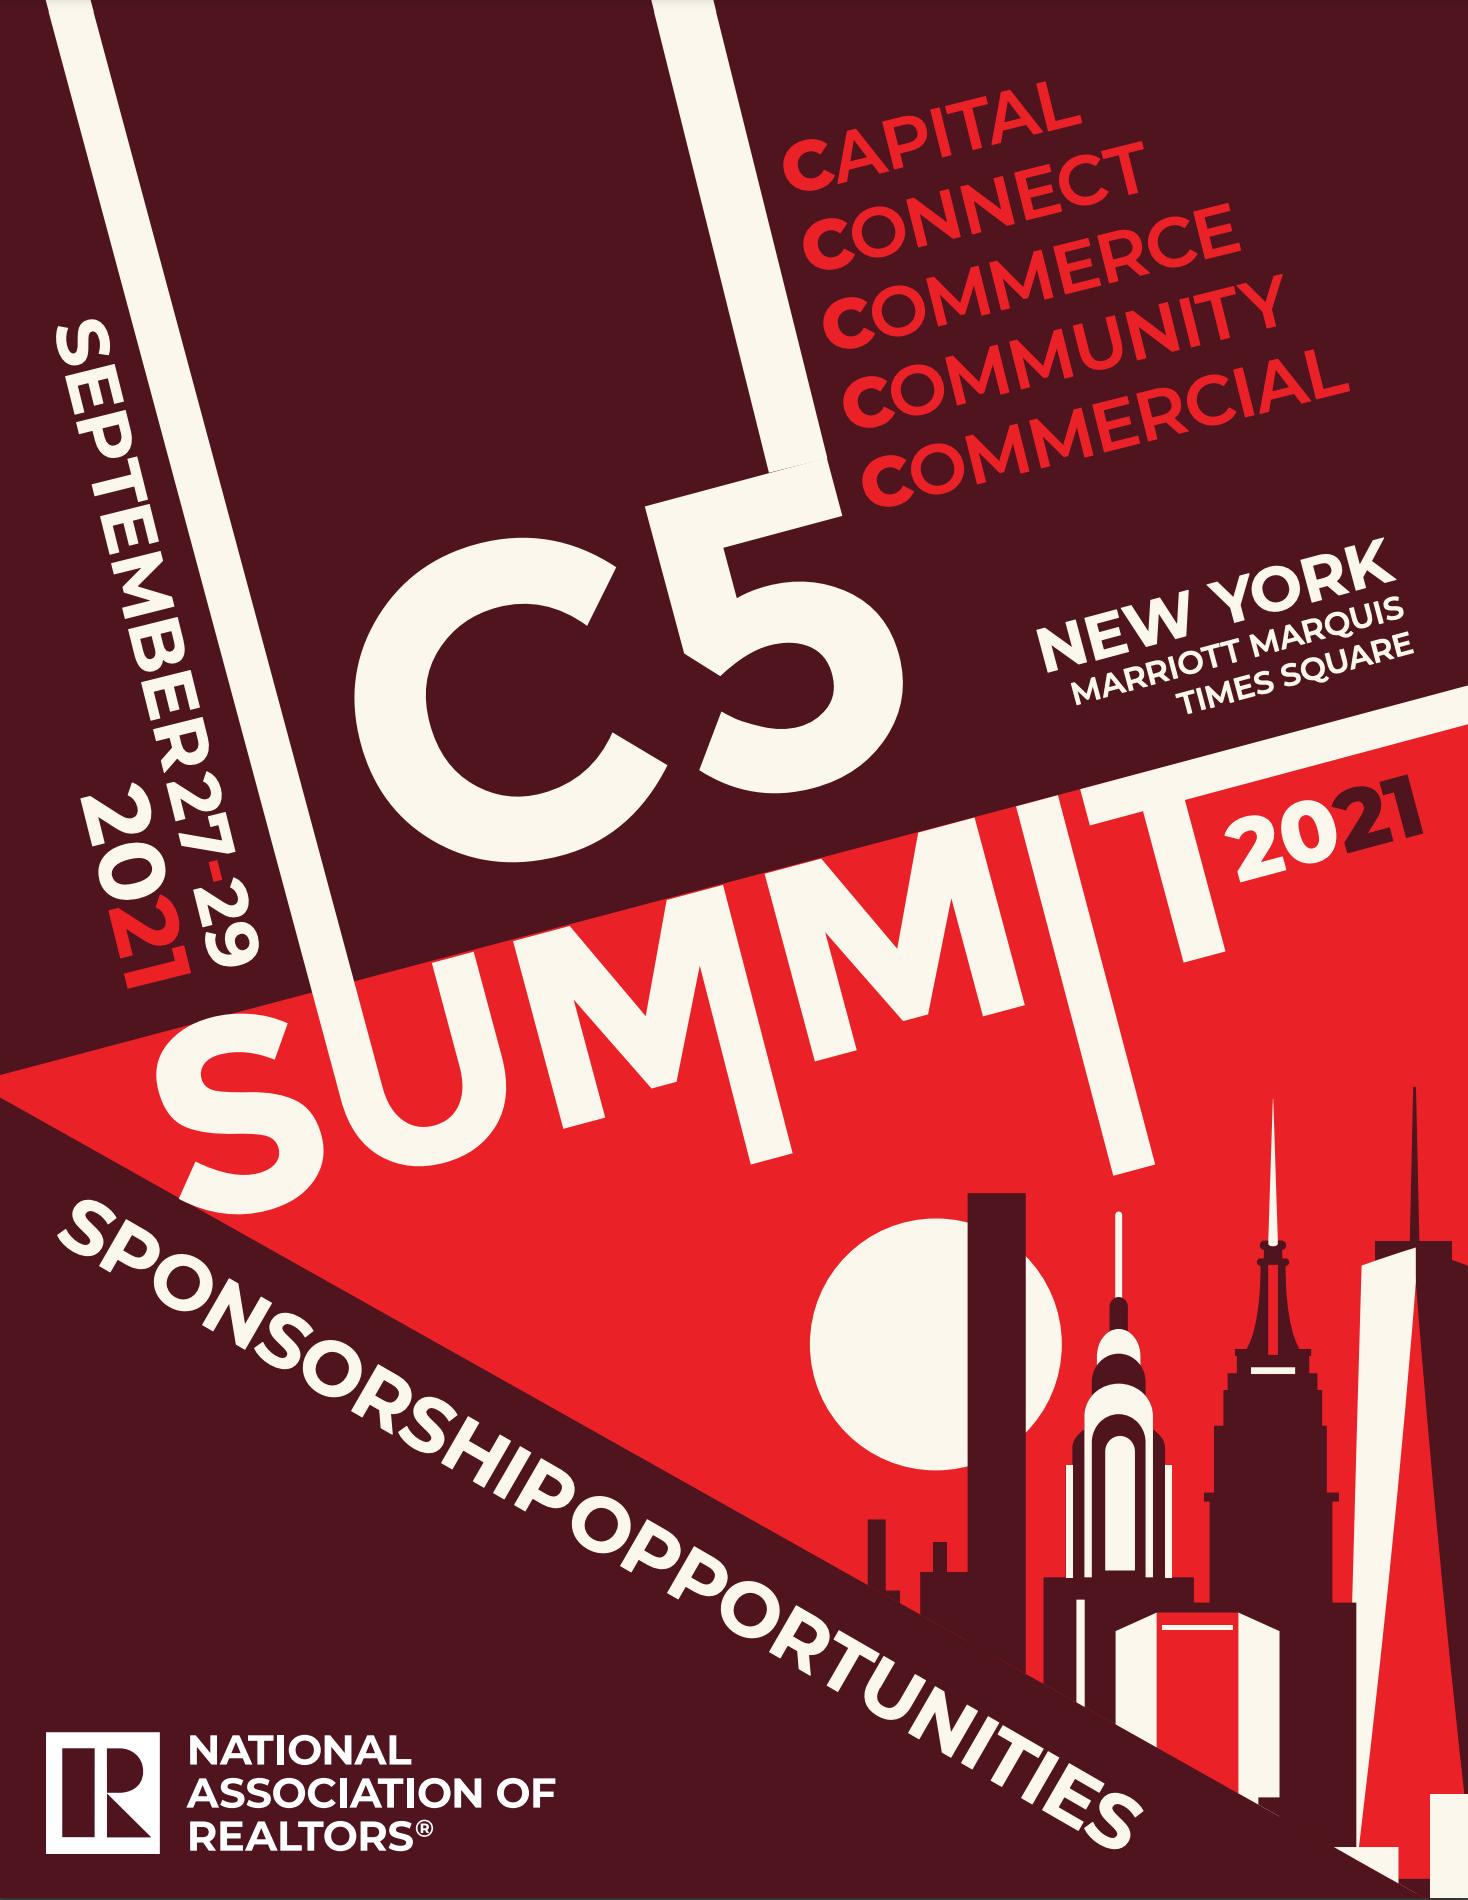 C5 Summit Sponsorship Prospectus image